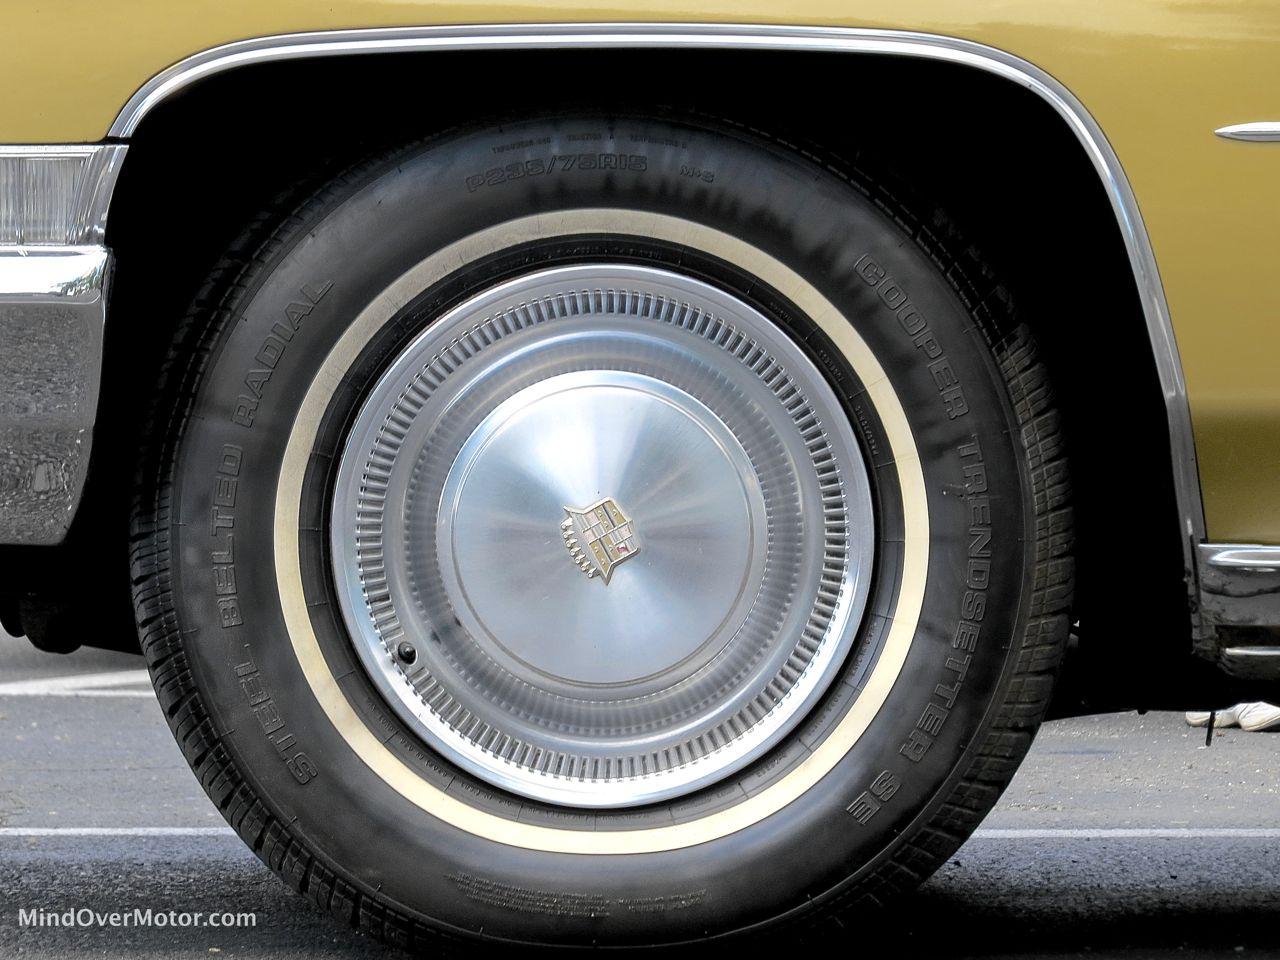 1971 Cadillac Sedan DeVille Wheel